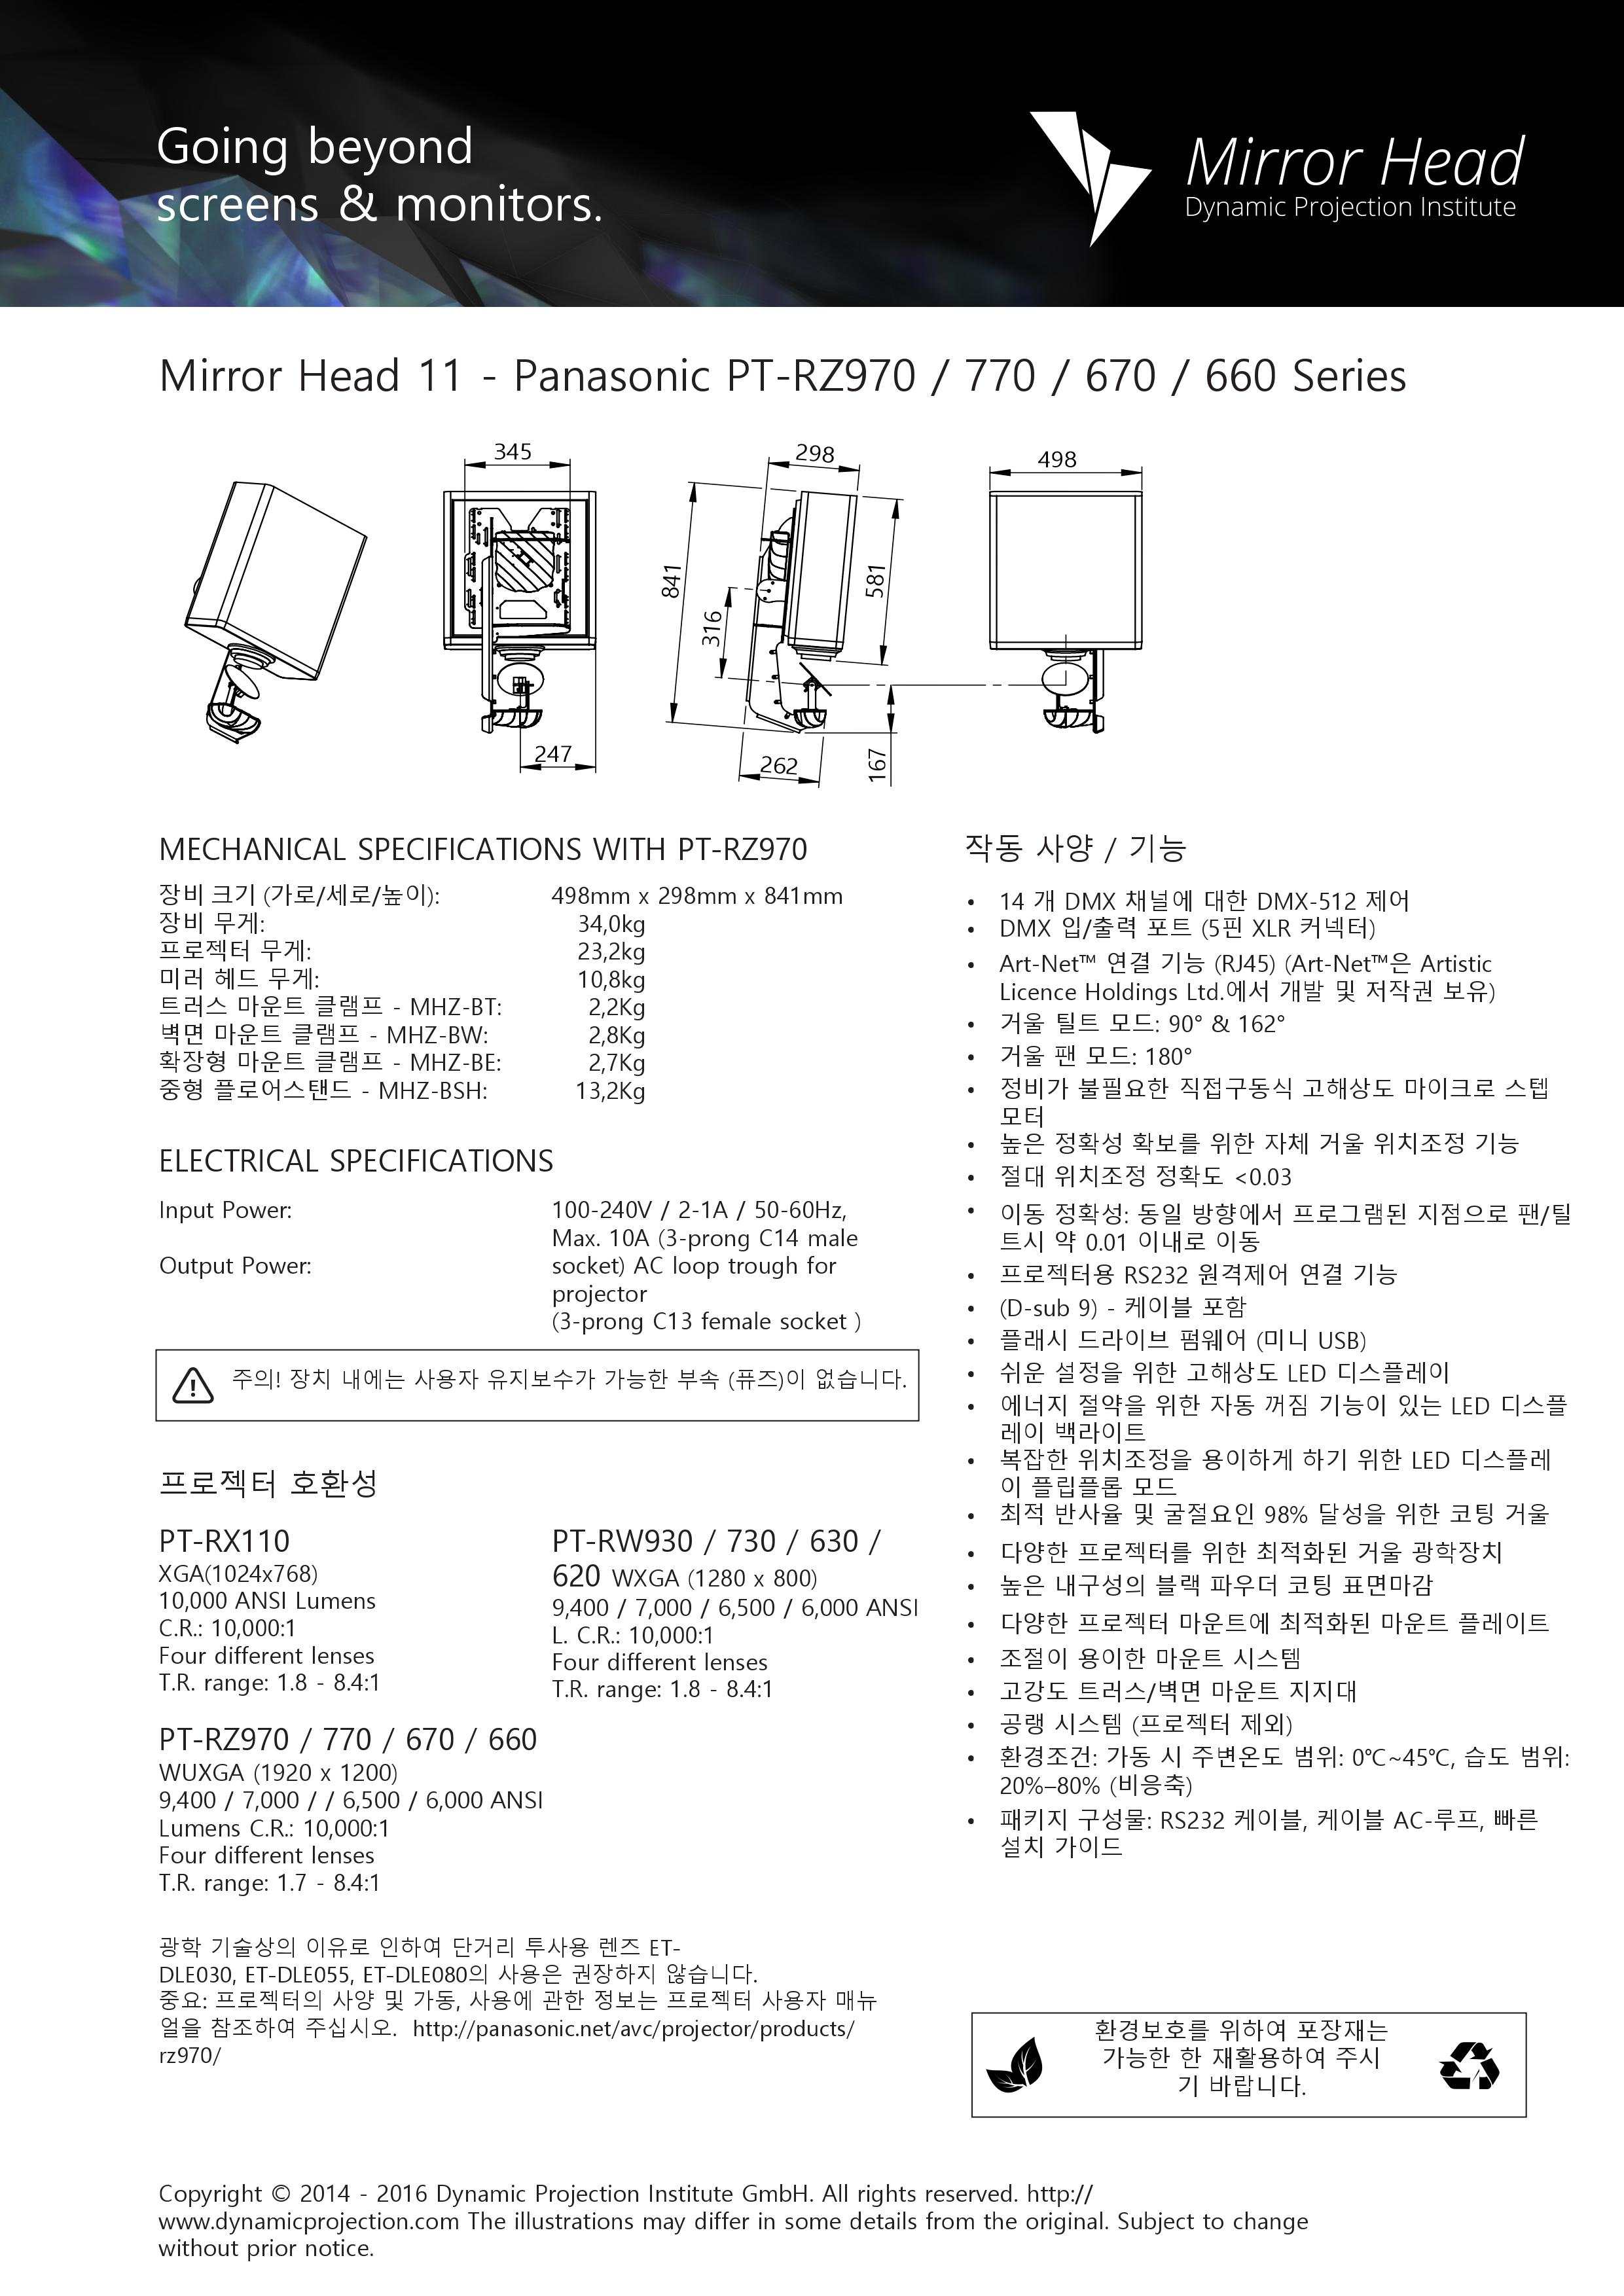 DPI_MH11_Panasonic_PT-RZ970_770_660 카다록.output (1).jpg